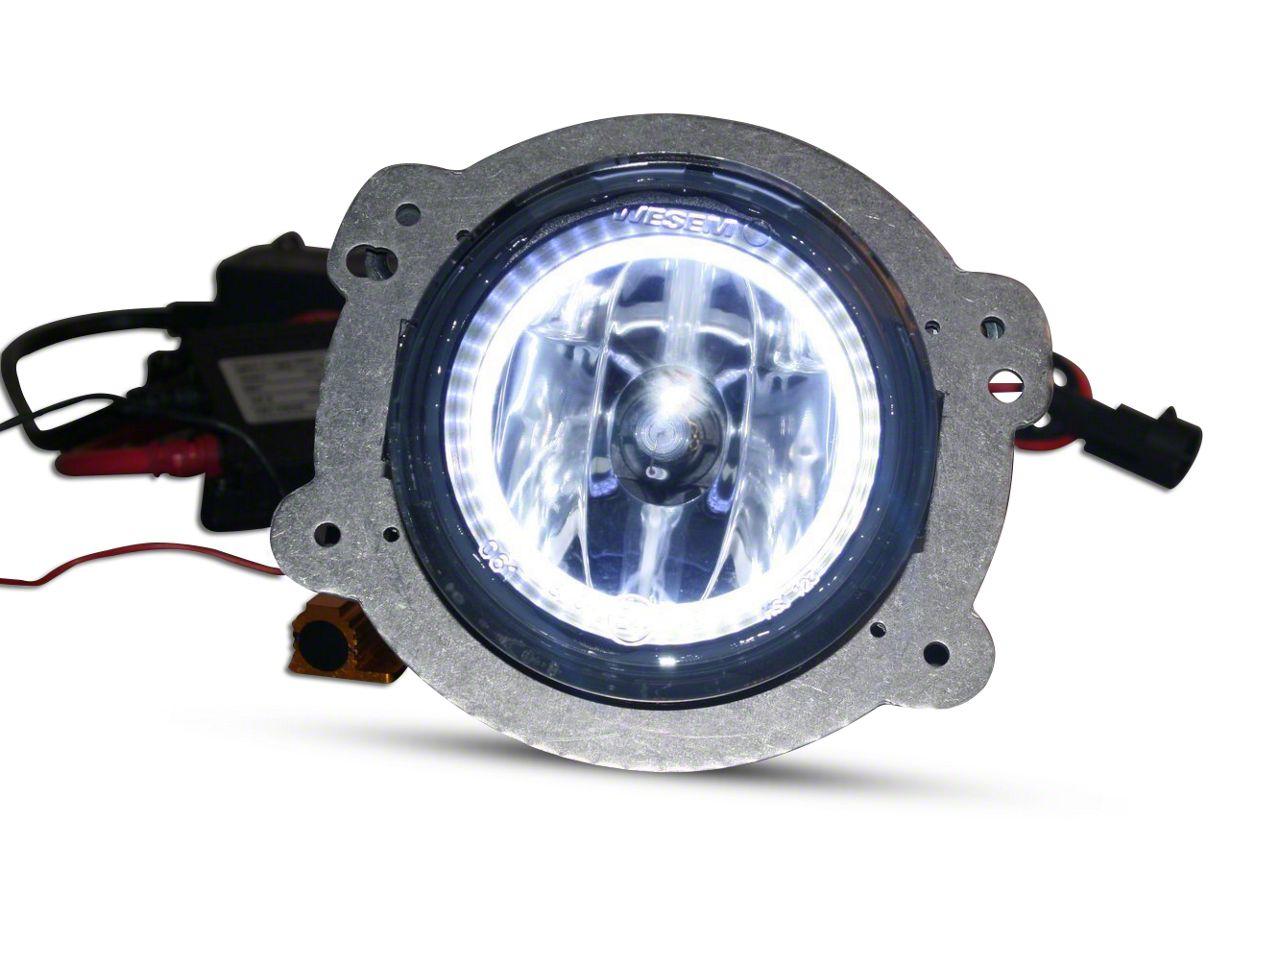 Delta 3.5 in. 3088 Series Xenon Bumper Fog Light Kit w/ Halos (07-18 Jeep Wrangler JK)